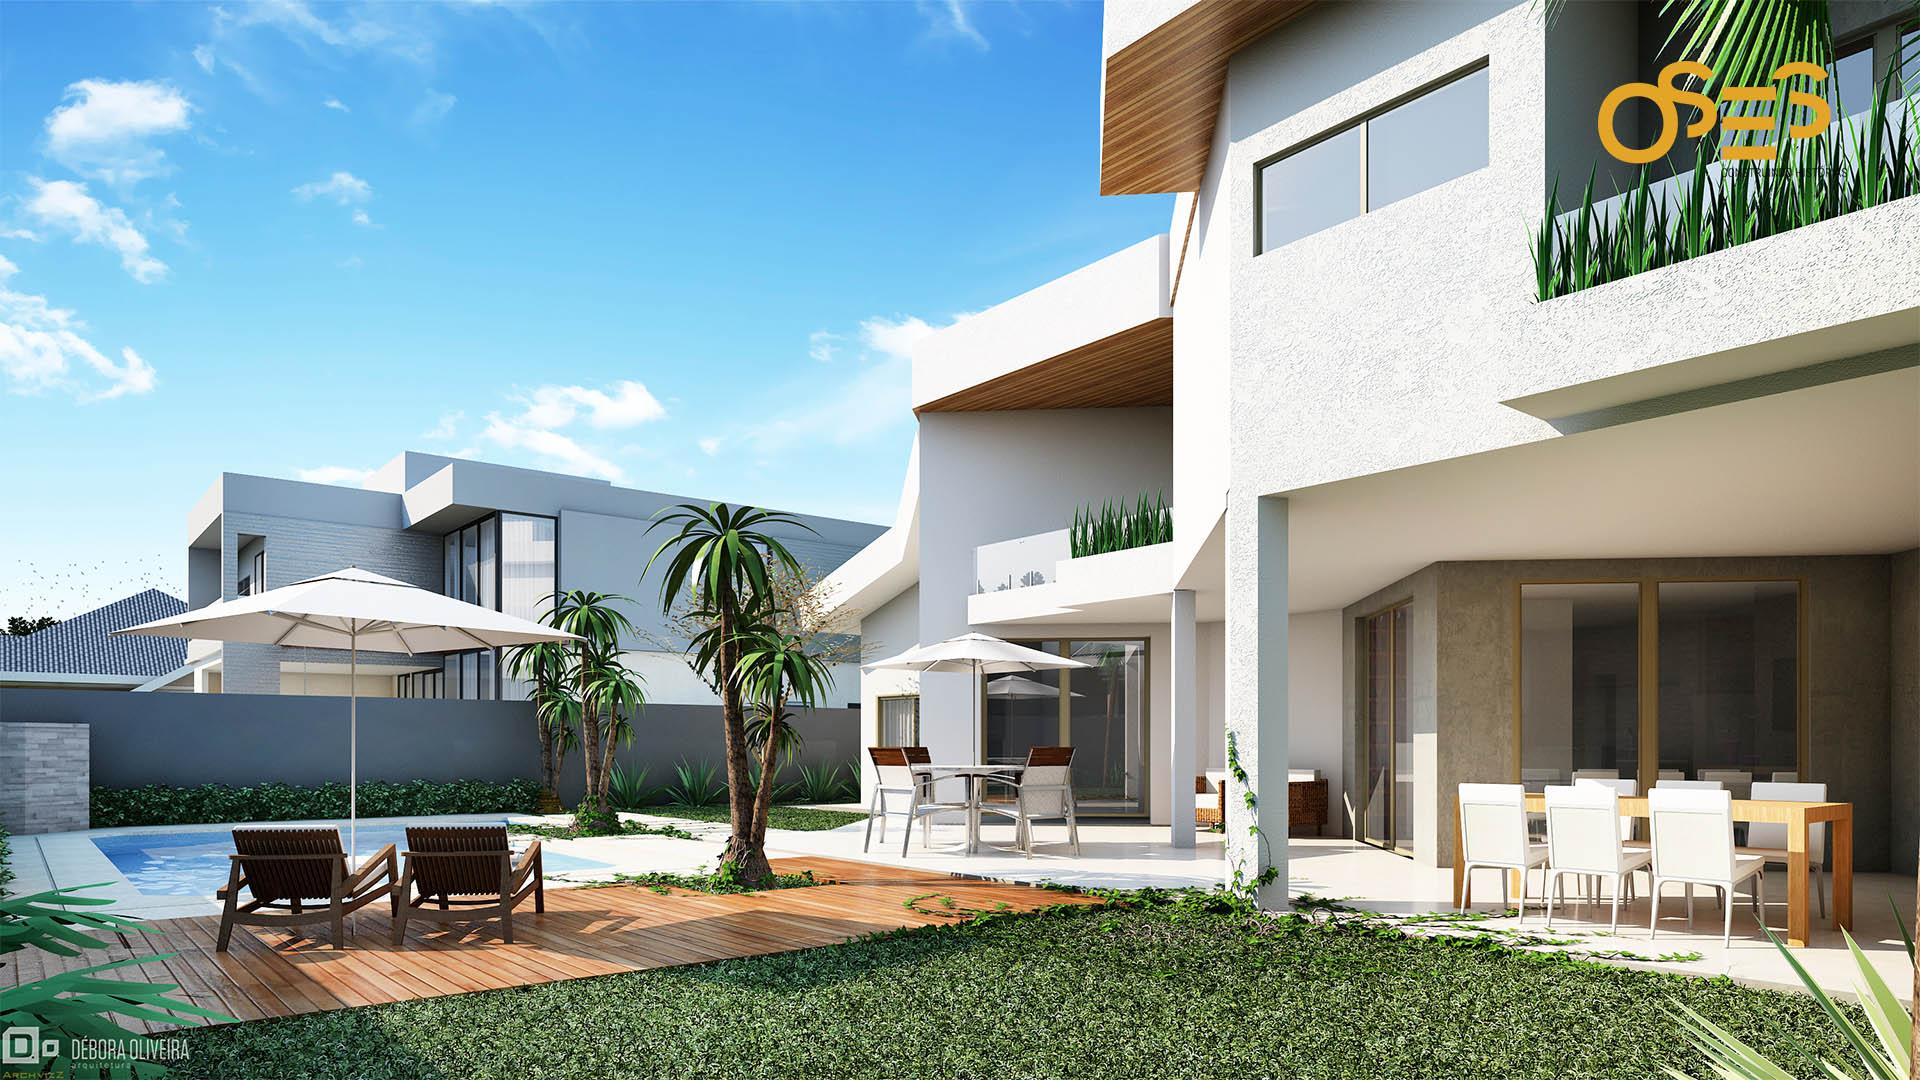 oses-construtora-casa-angular (2)